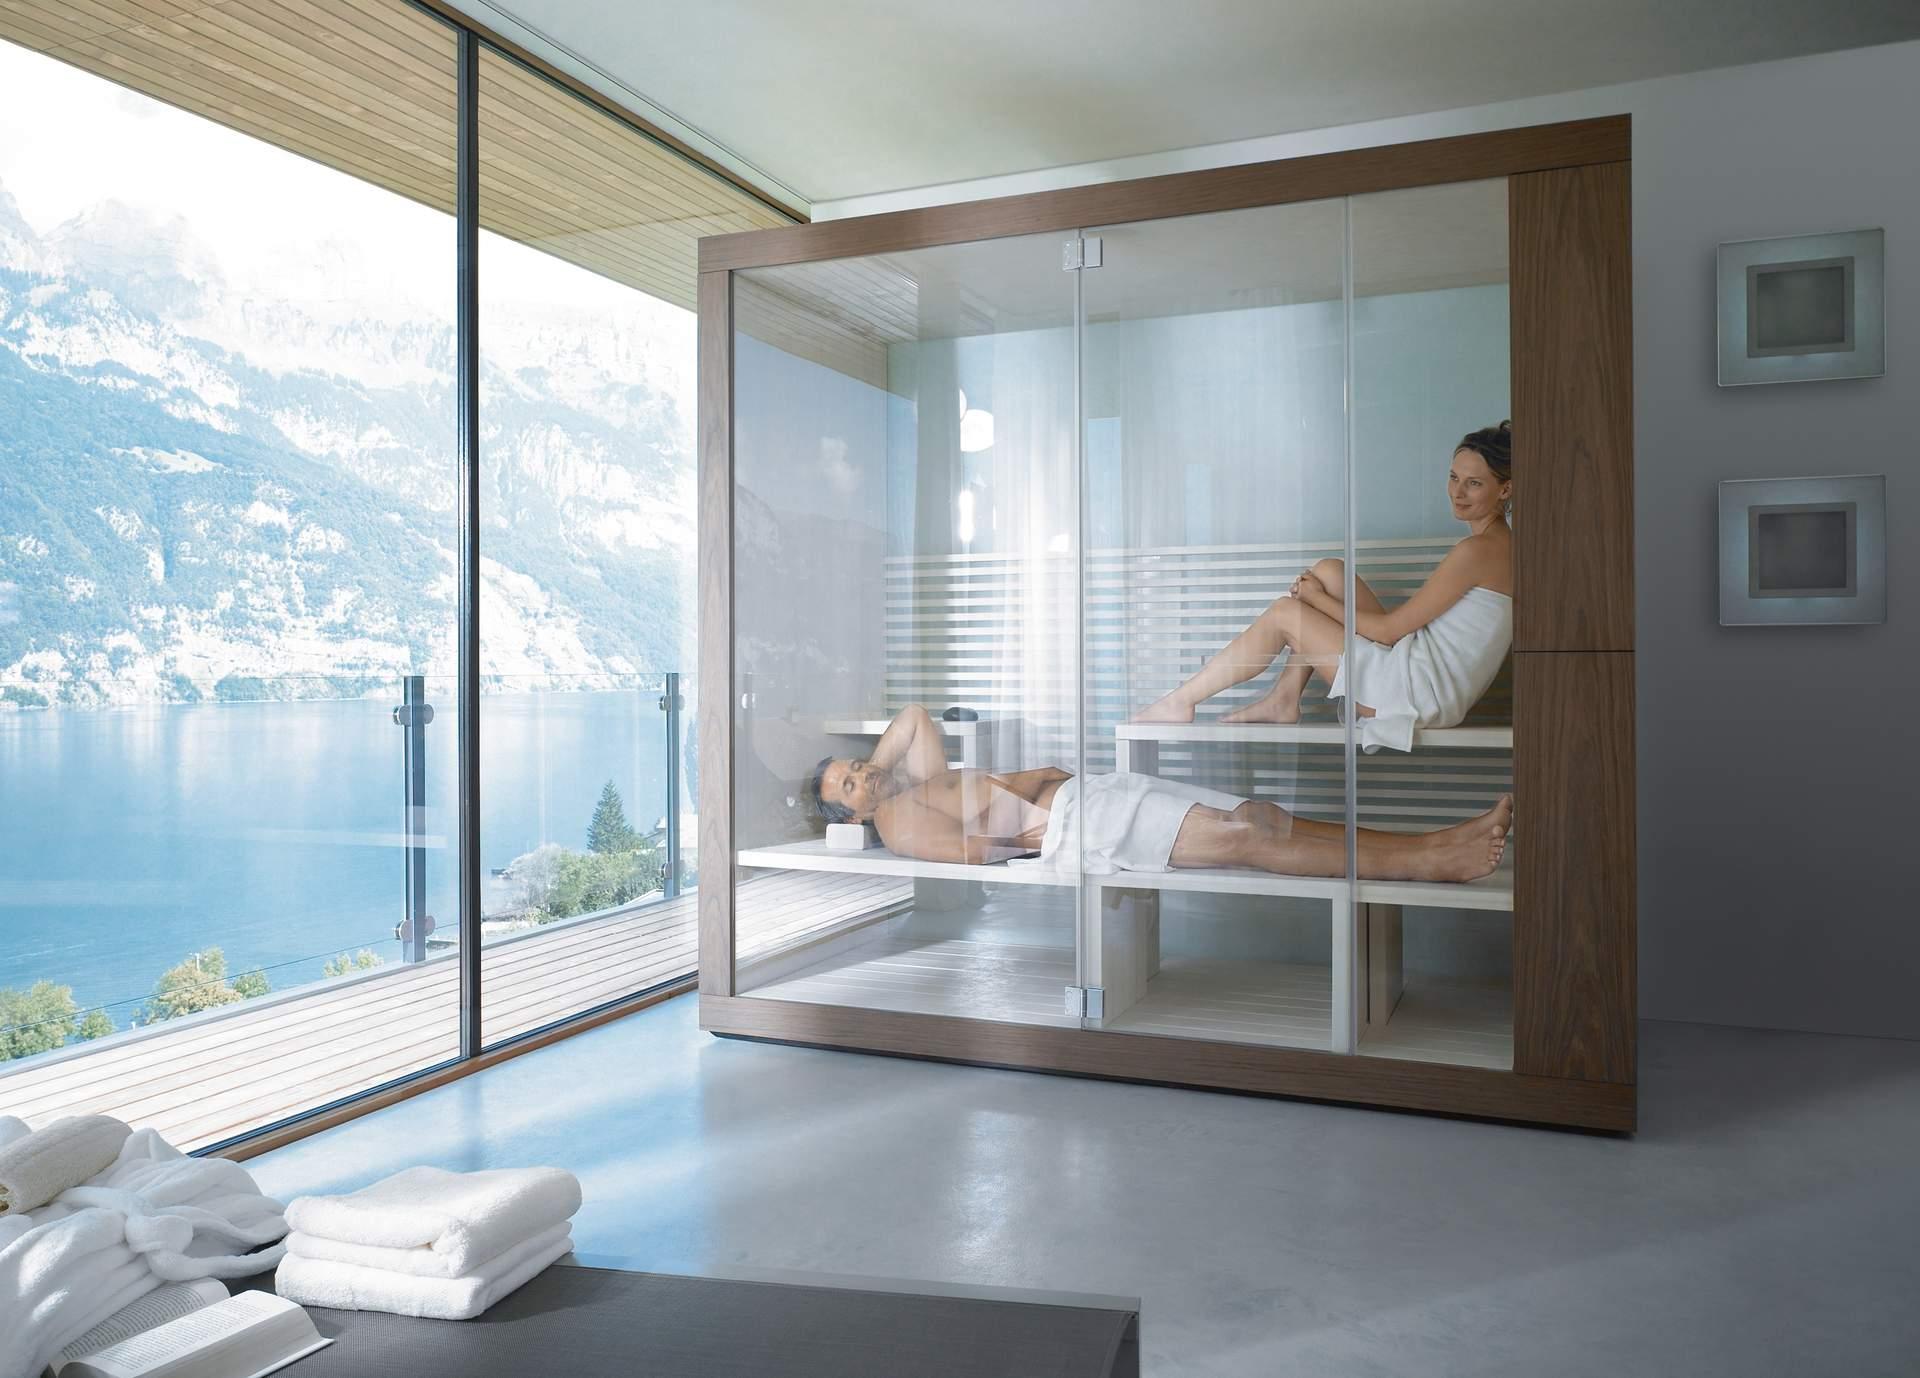 Erholungswelt Privates Badezimmer